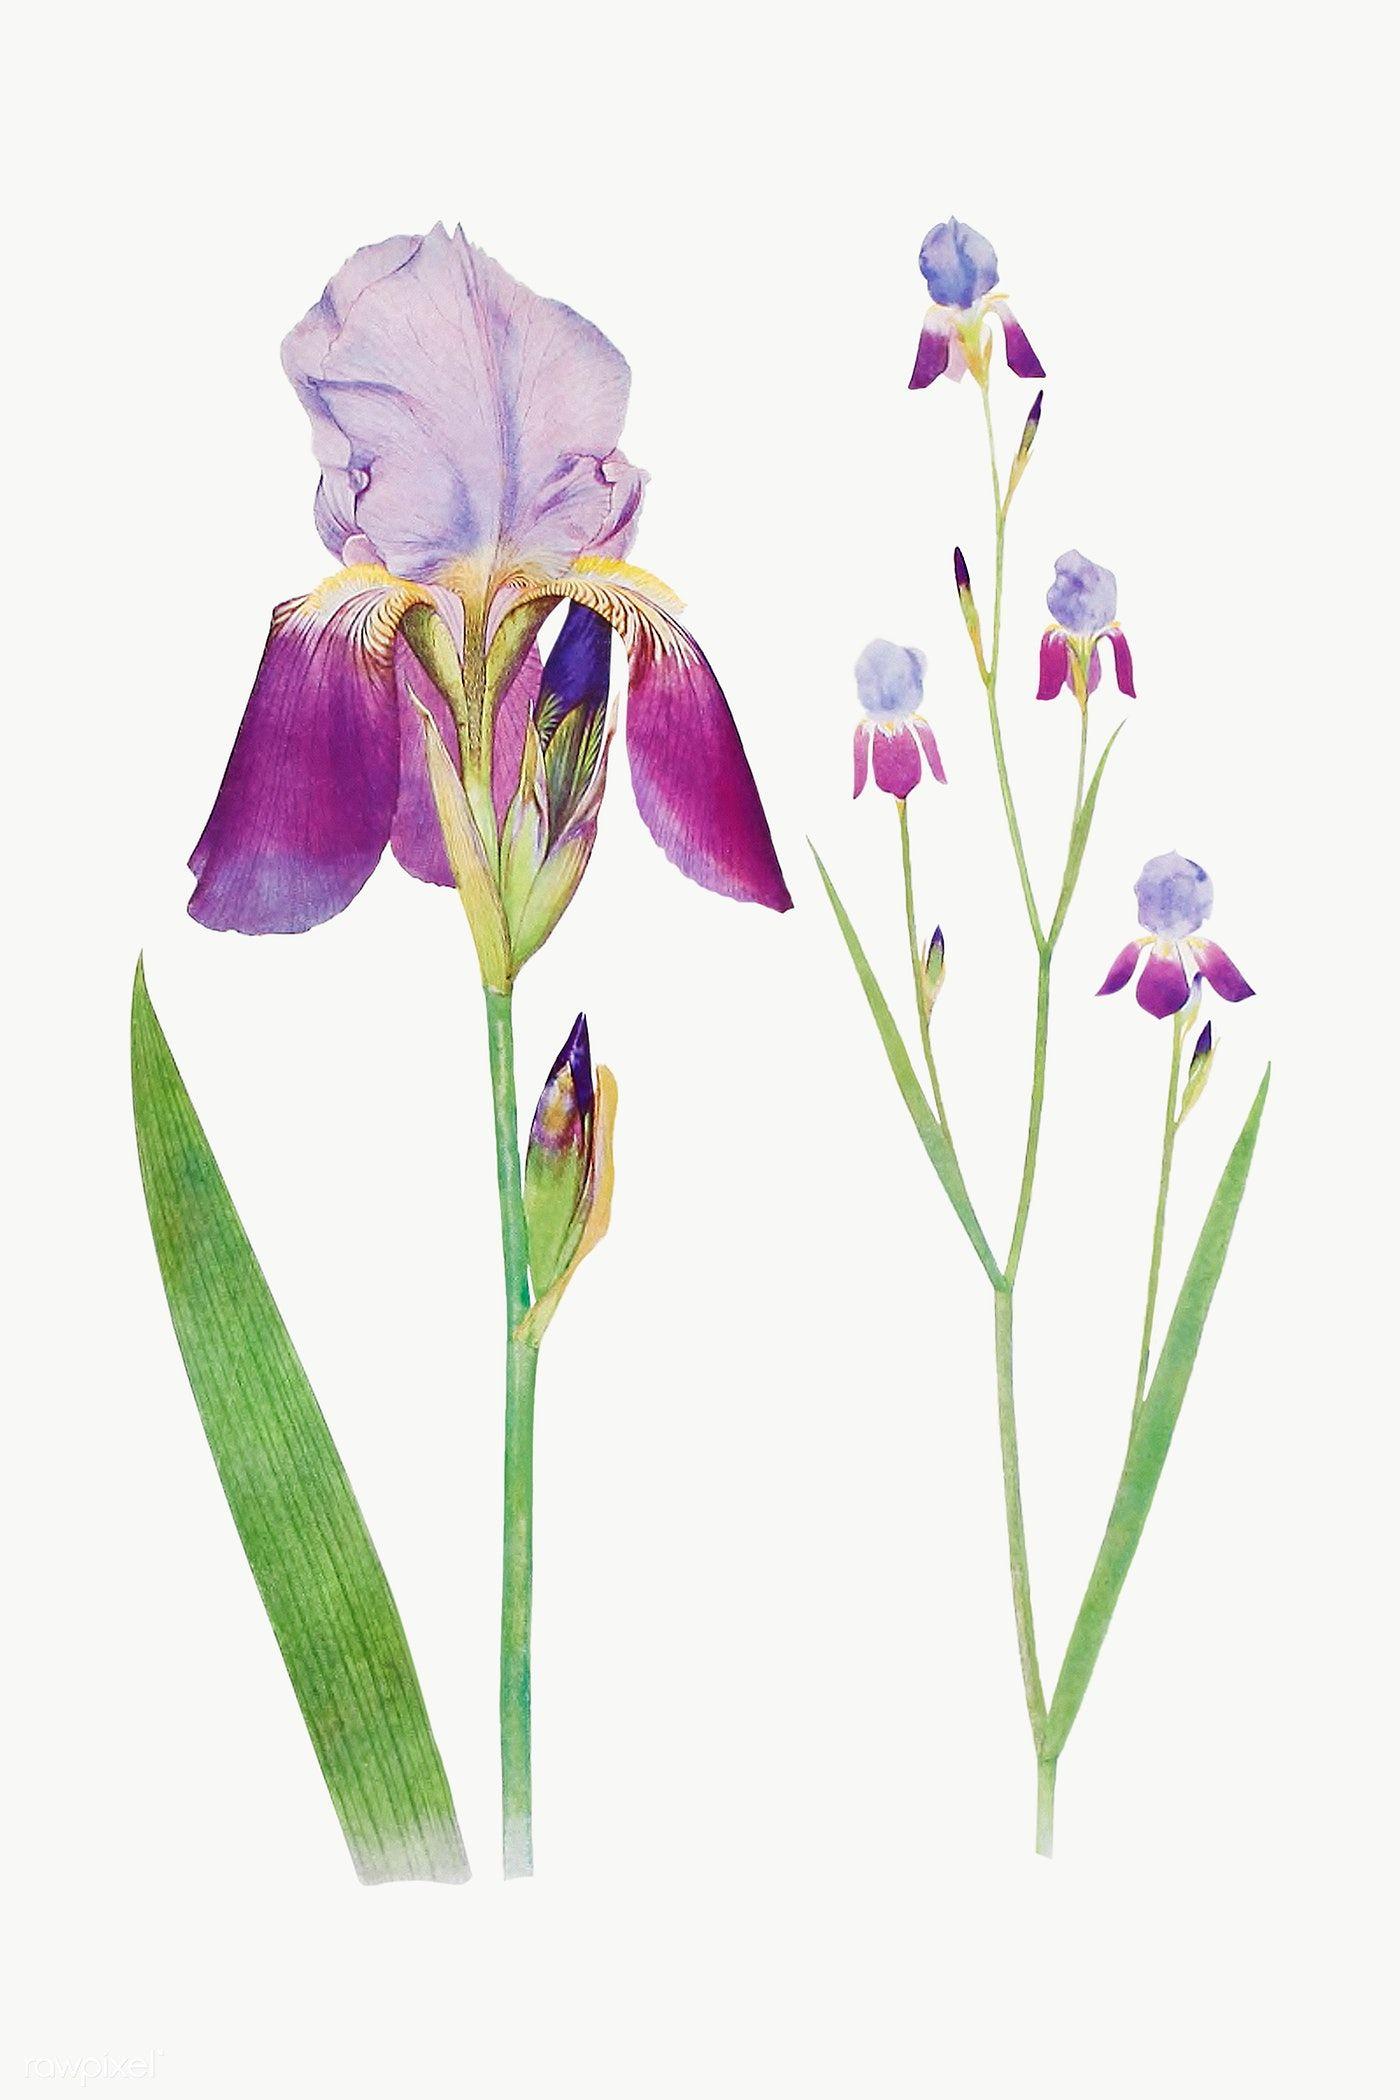 Vintage Iris Flower Illustration Transparent Png Premium Image By Rawpixel Com Flower Illustration Iris Flowers Botanical Drawings